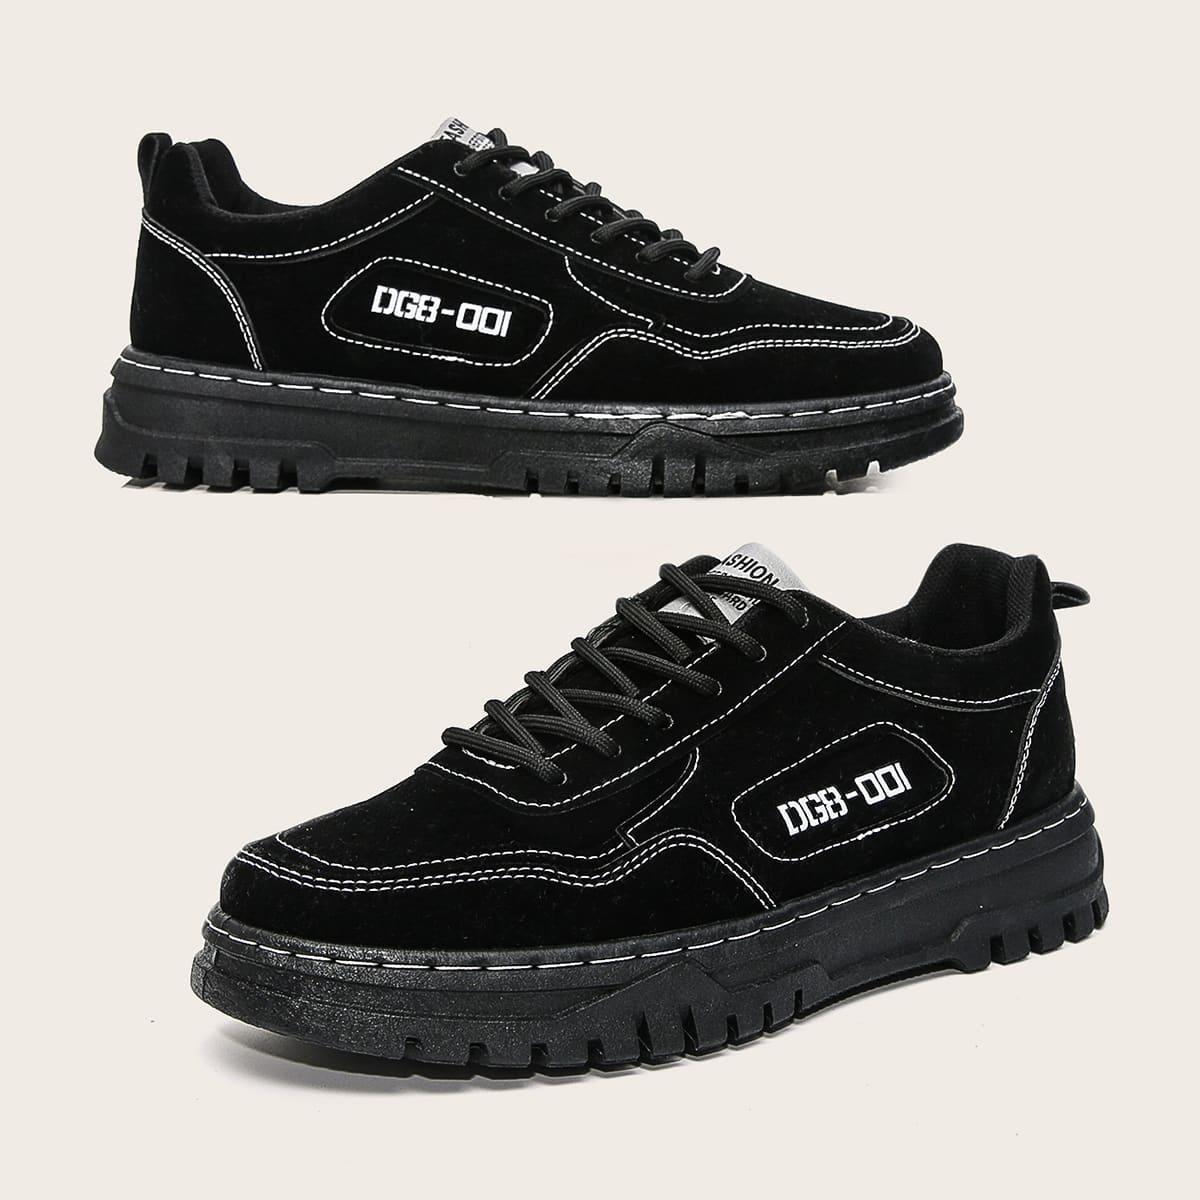 SHEIN Kant Tekst Gekleede schoenen